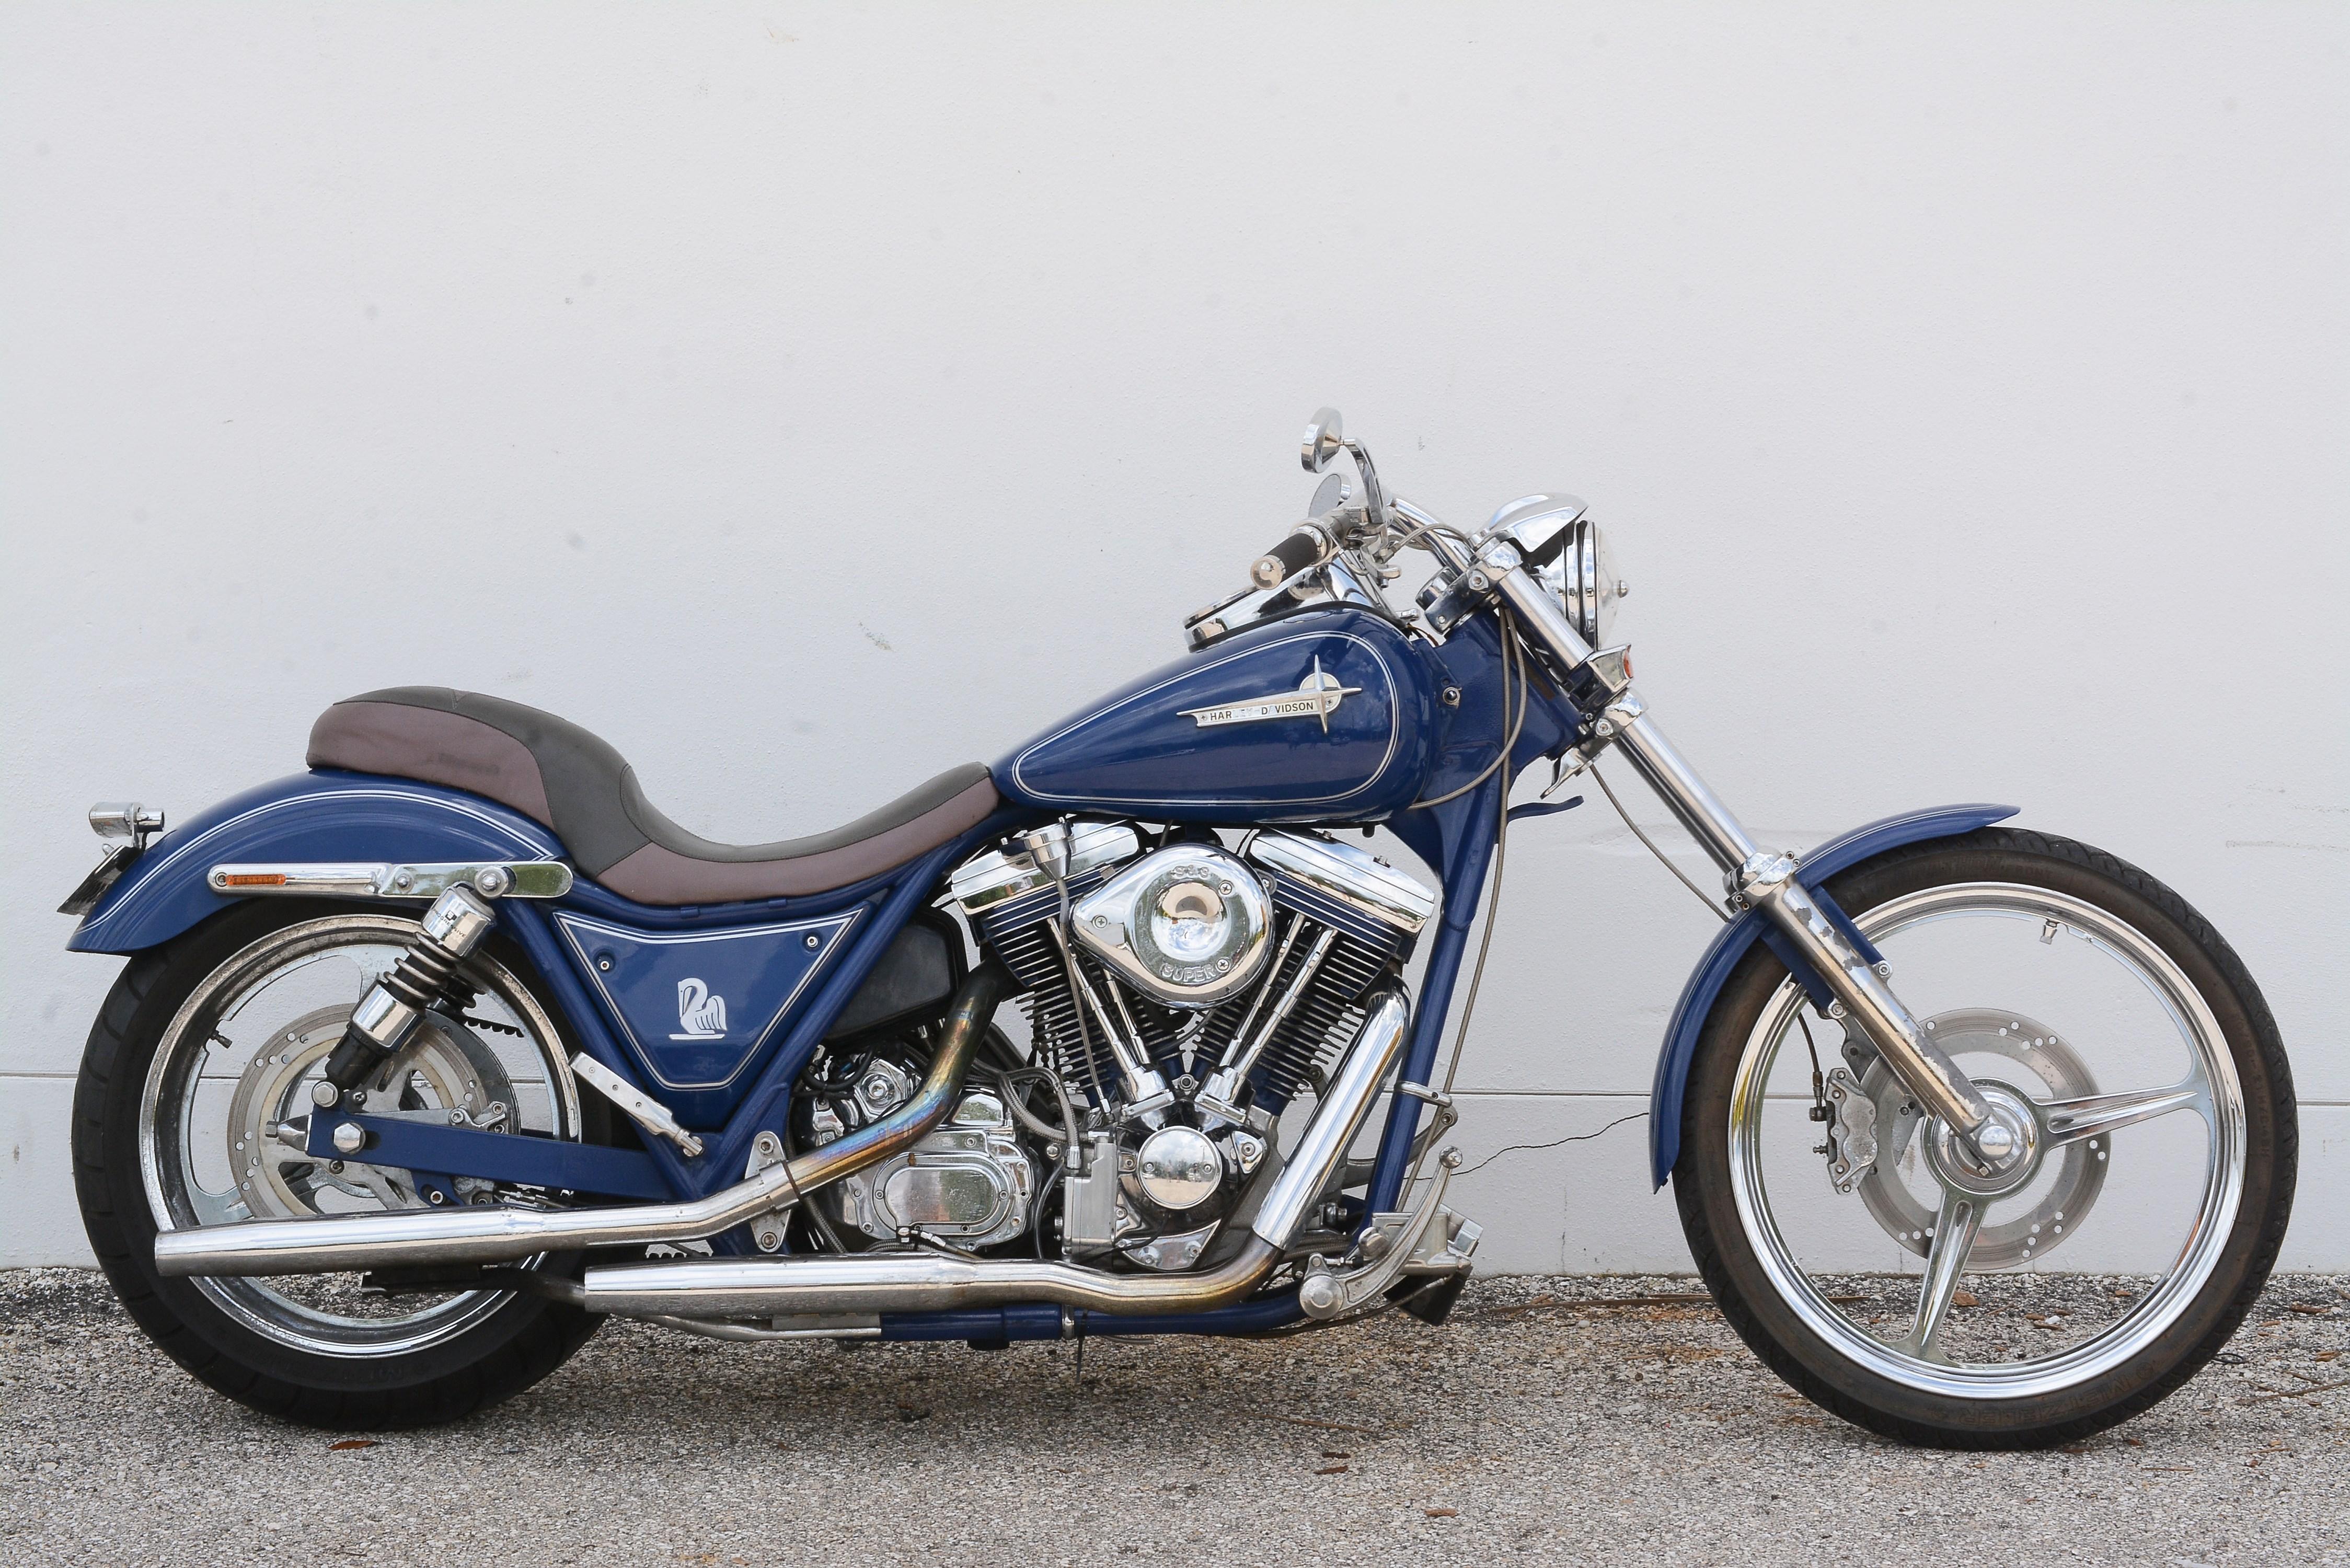 1991 Harley-Davidson® FXRS Low Rider®